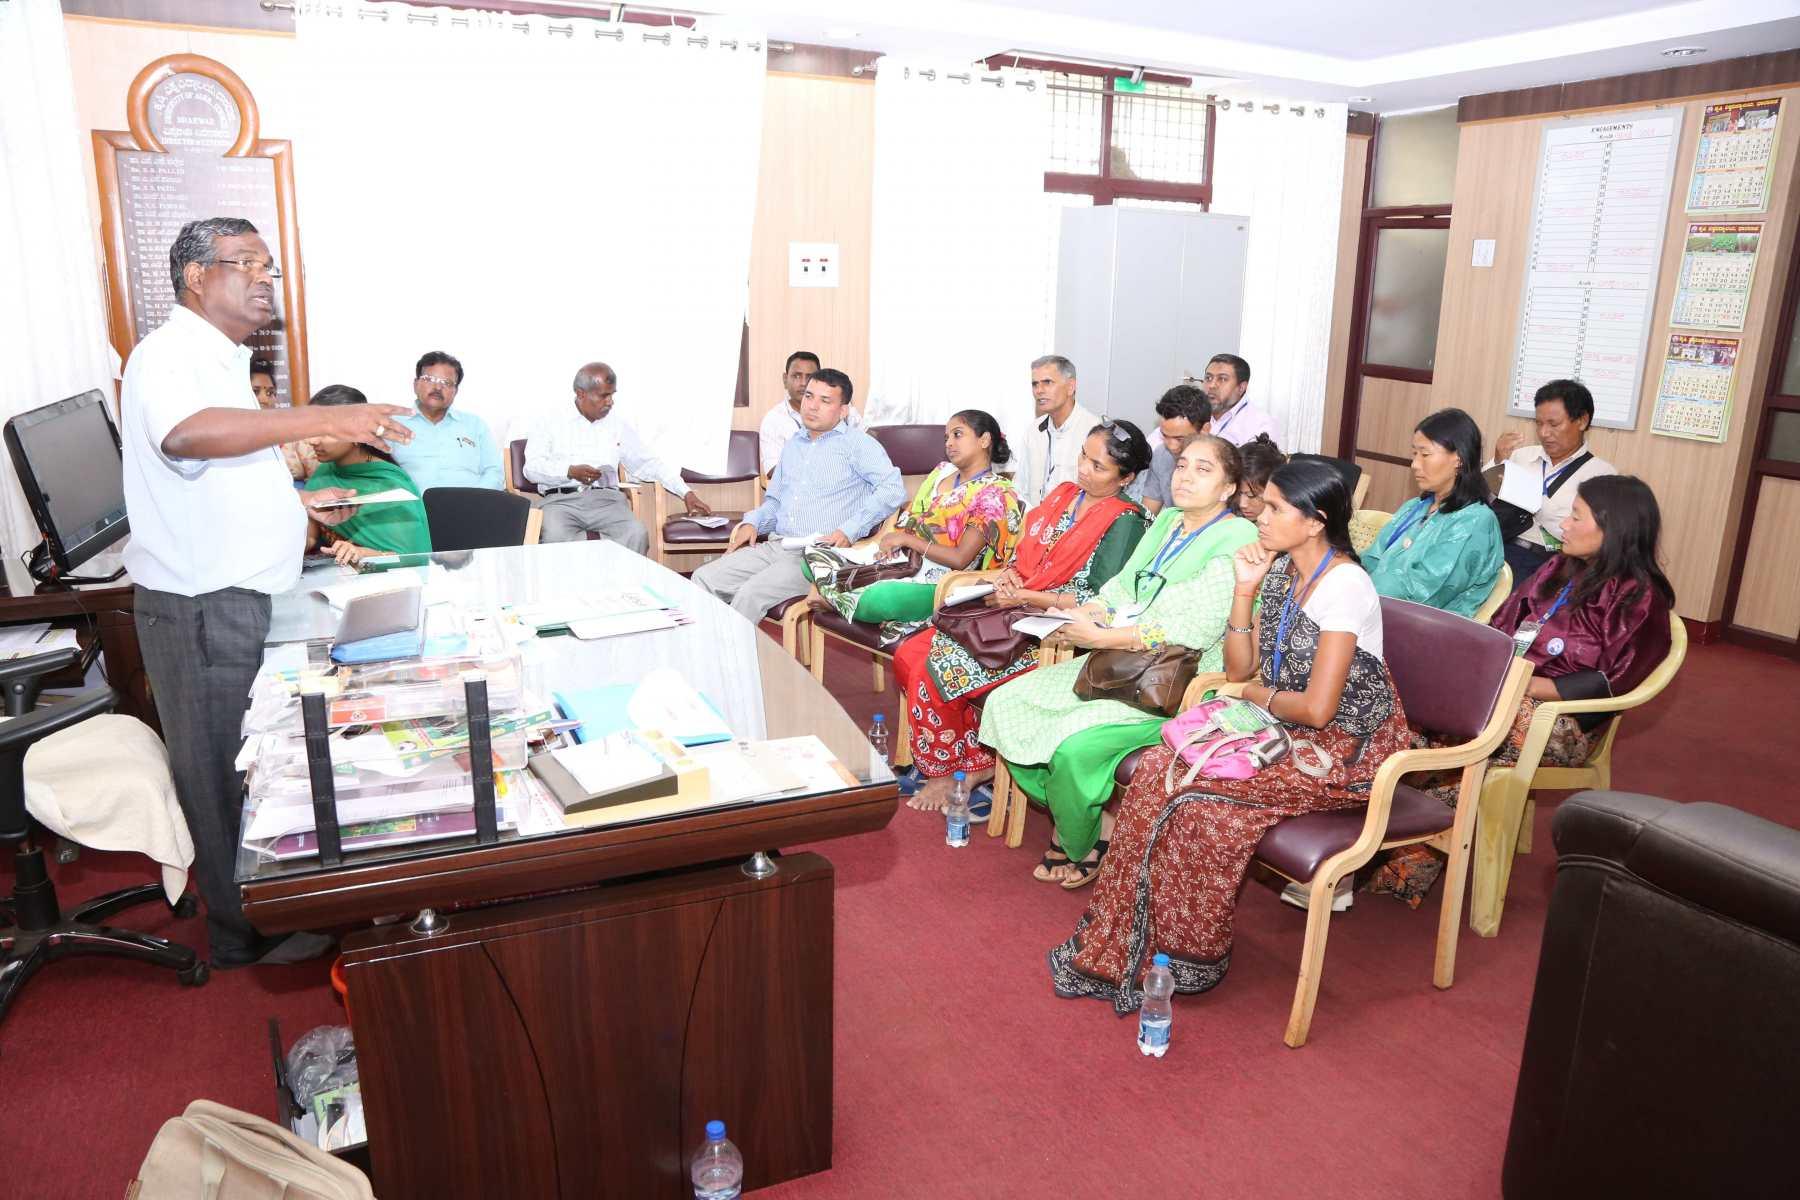 Dr. Benegi giving exposure on farmer's help line